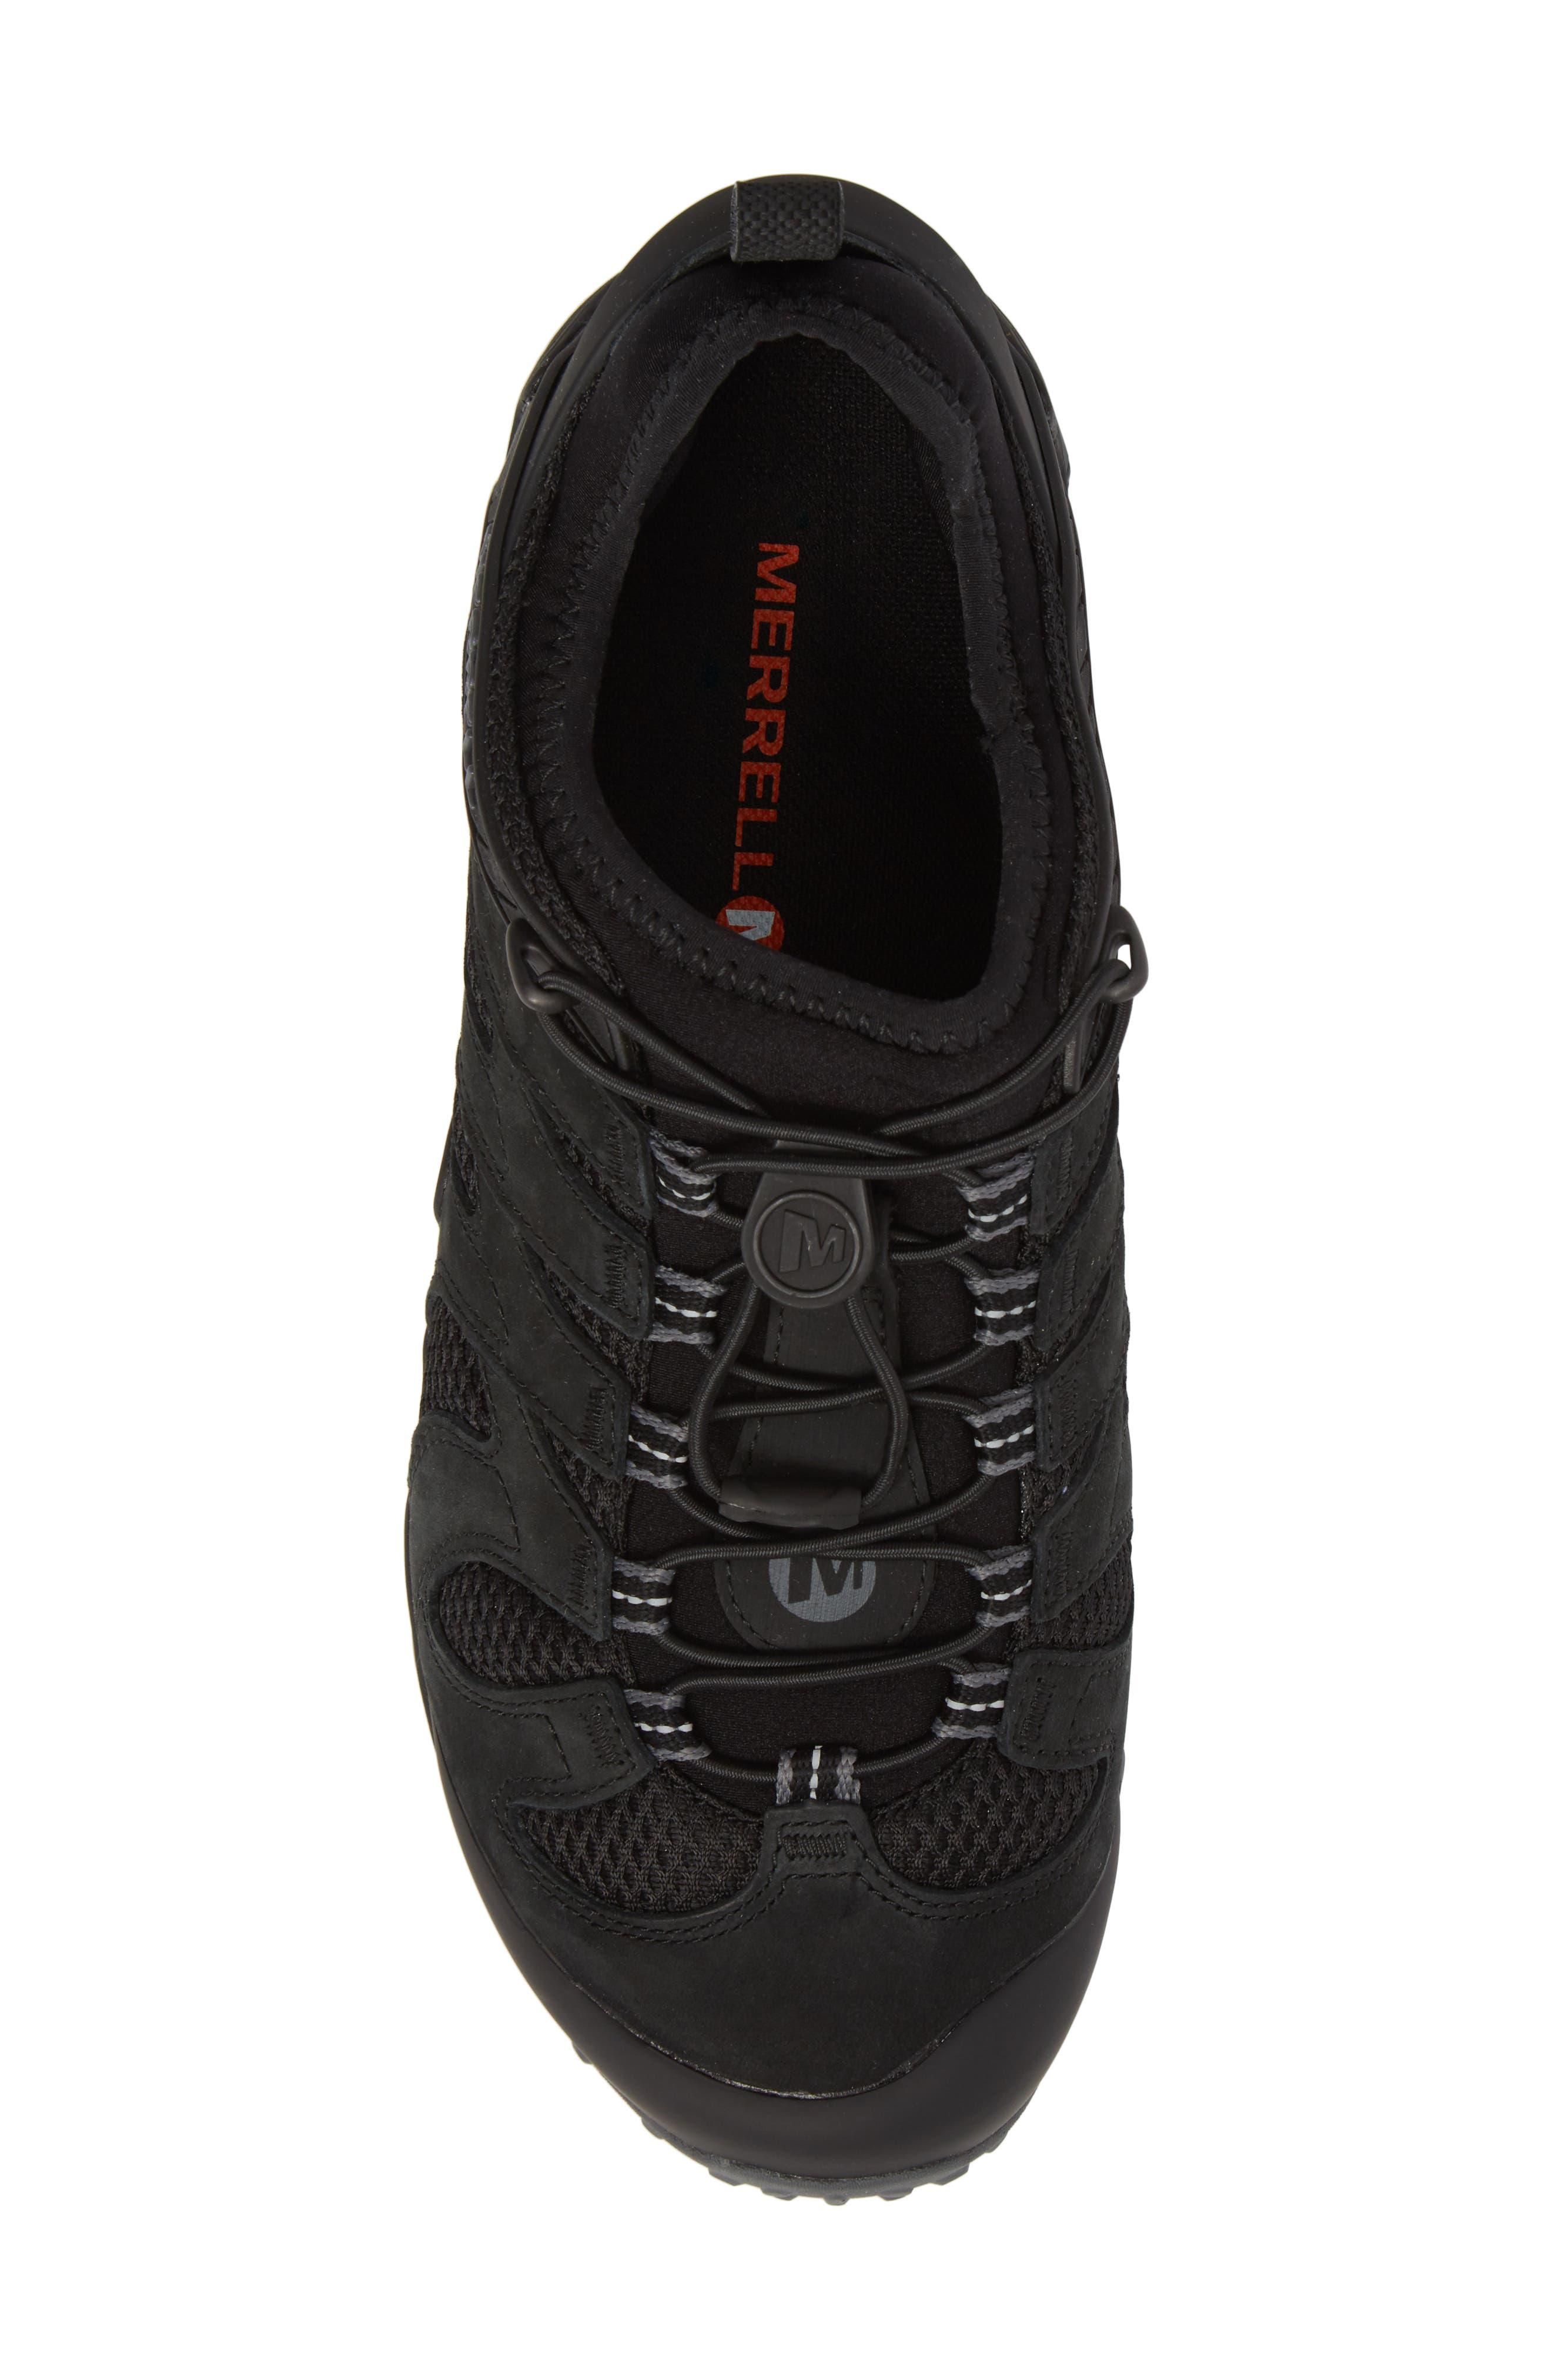 Chameleon 7 Stretch Hiking Shoe,                             Alternate thumbnail 5, color,                             Black